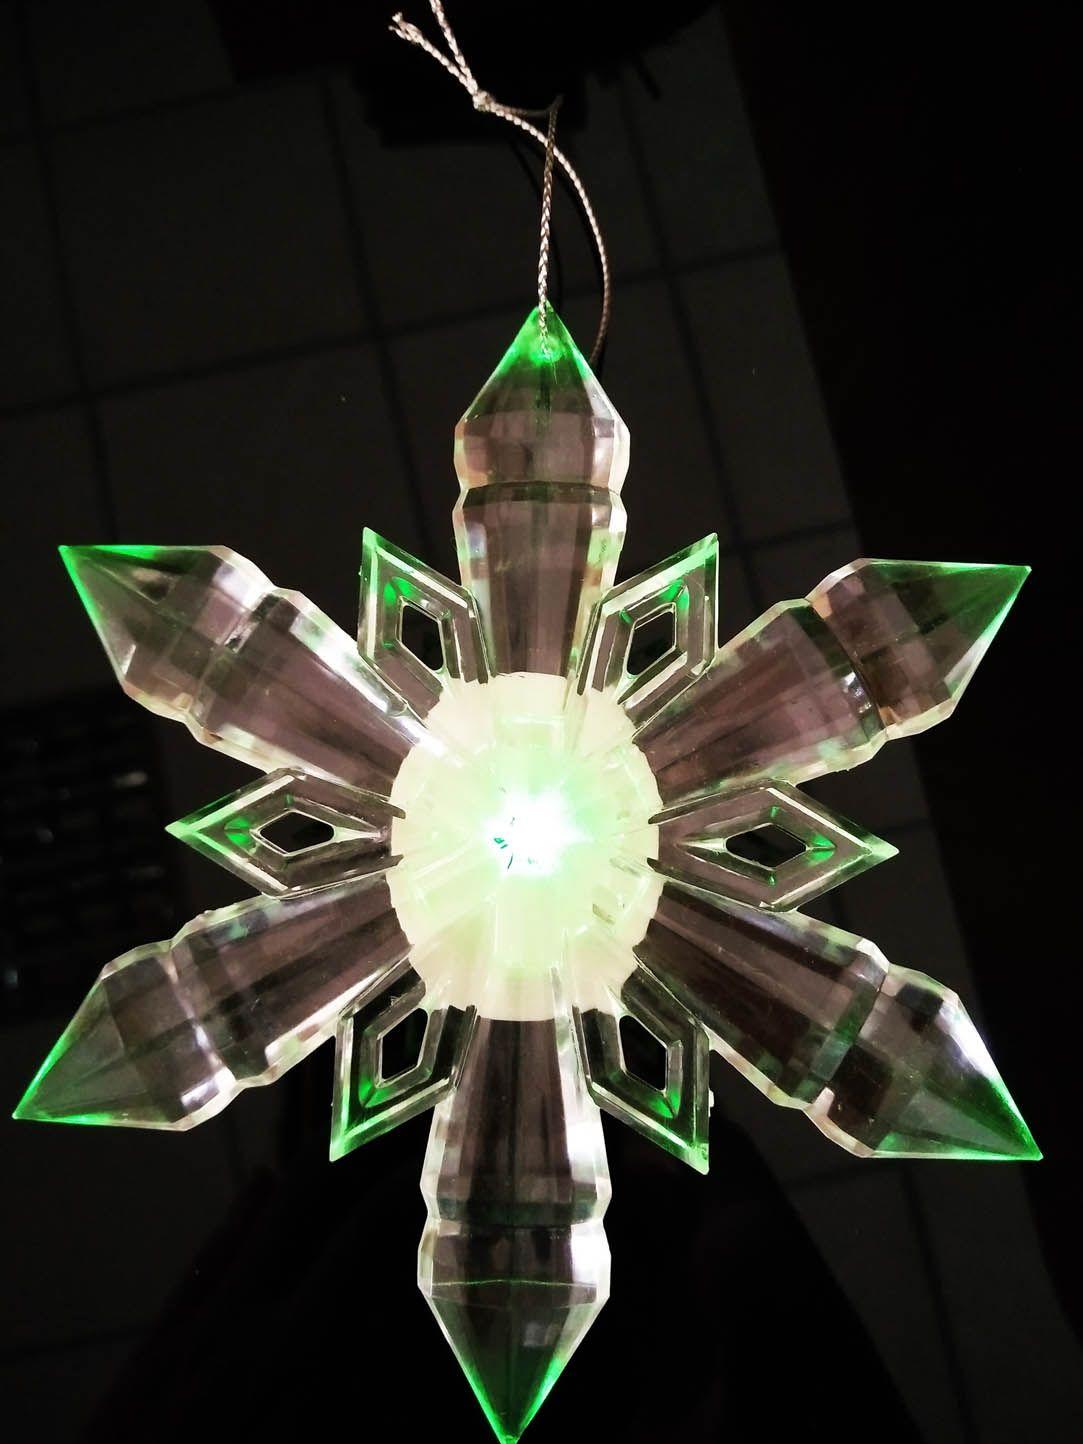 New brand LED window suction snowflake decoration light christmas festive decorations acrylic fascinating snowflake design drop shipping